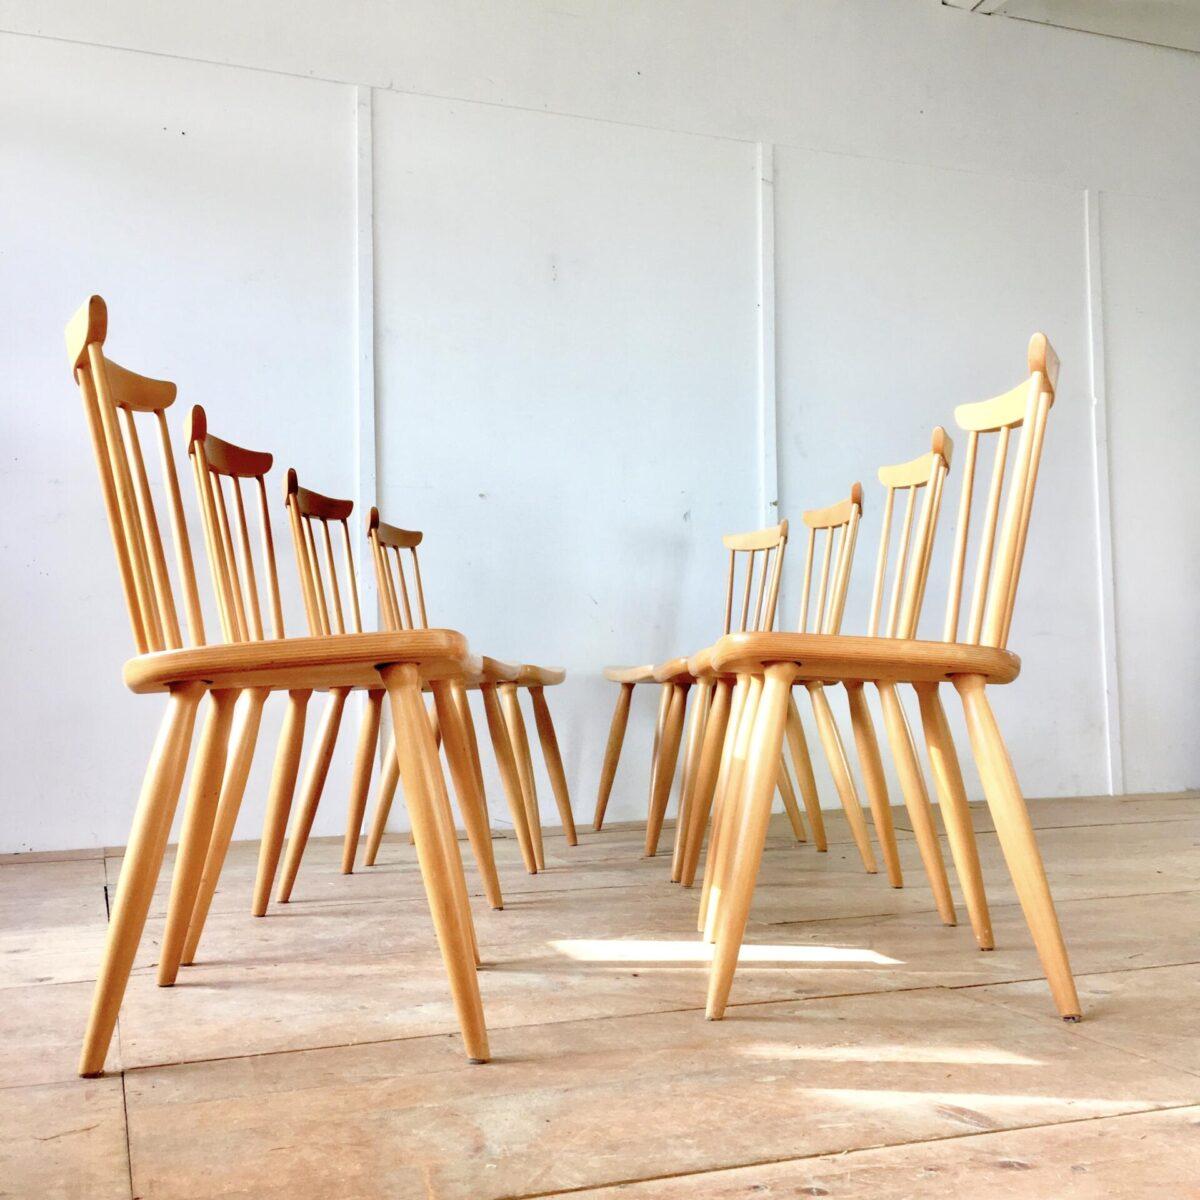 8 Esszimmer Stühle 70s Stäbli Stühle. Preis pro Stuhl.